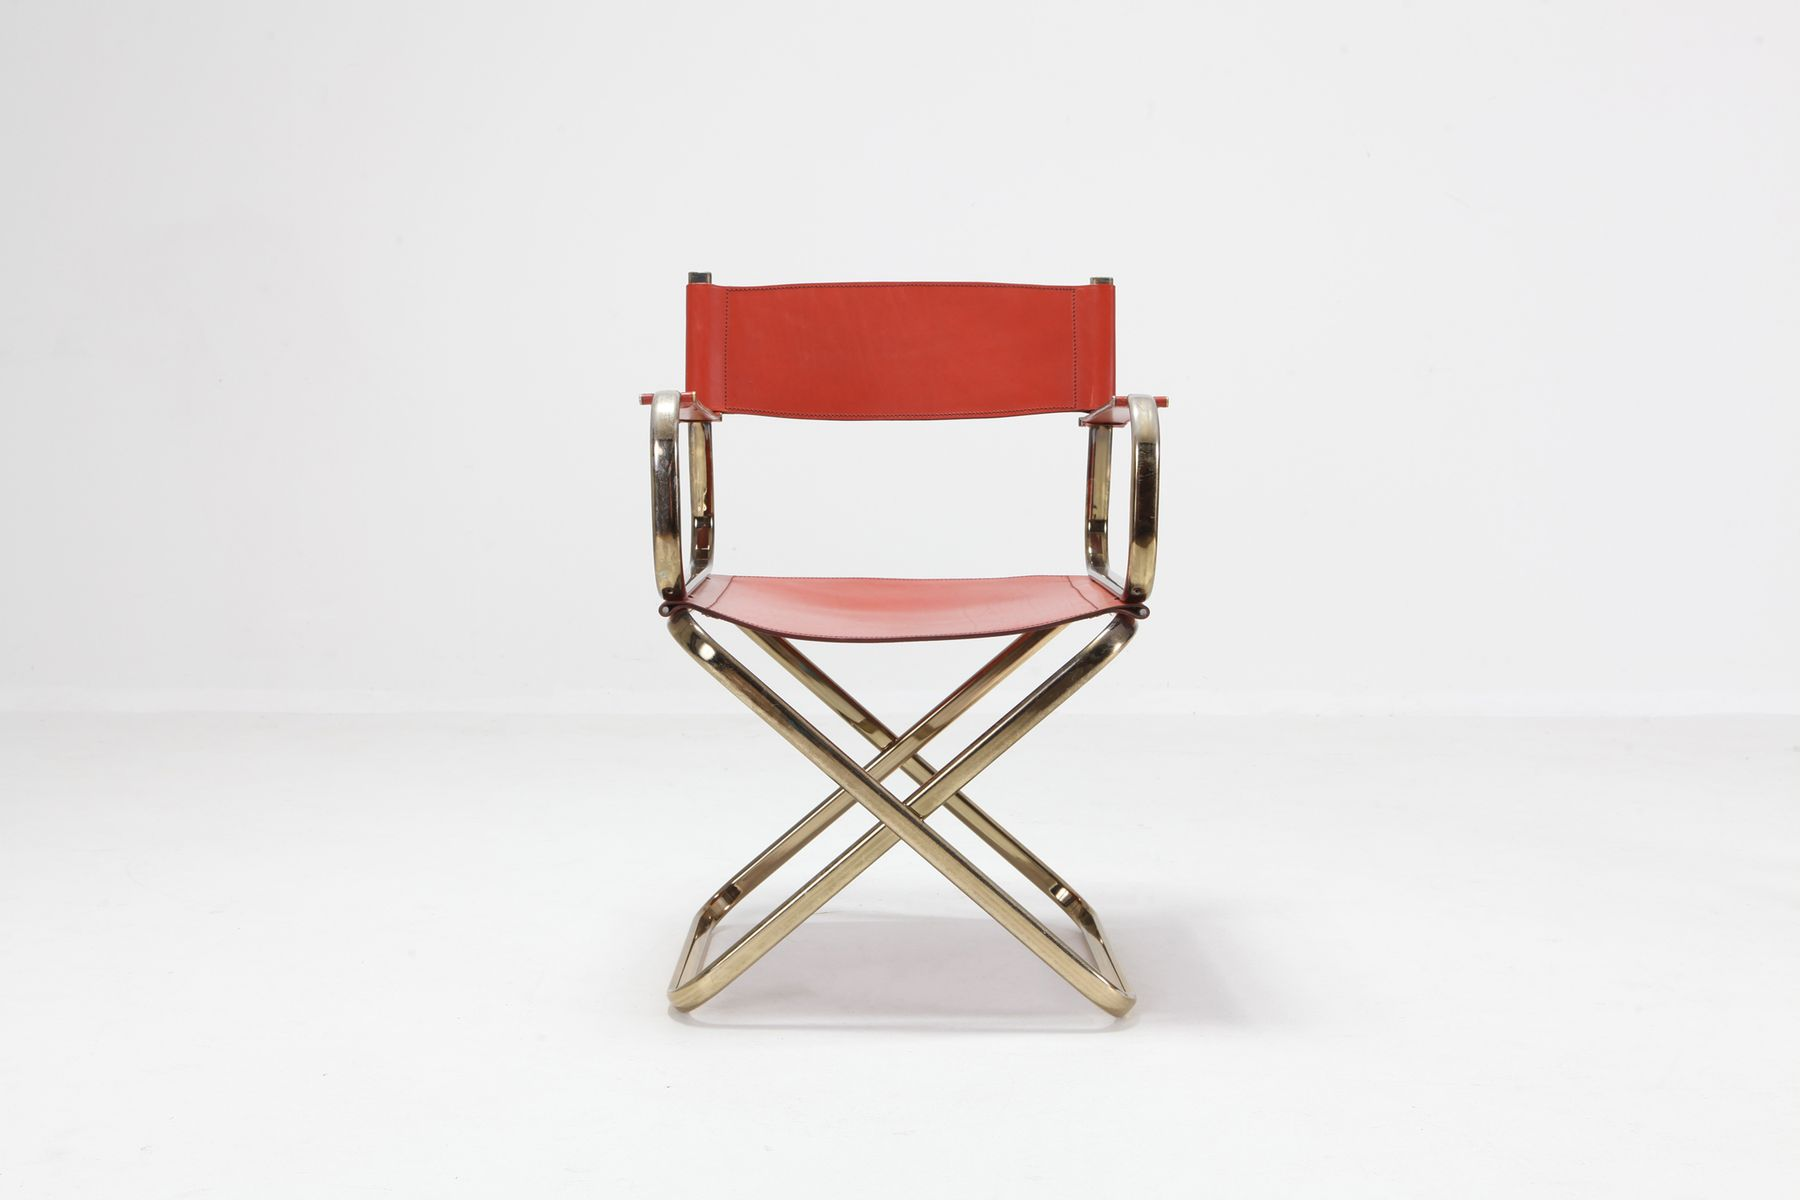 Sedie da regista mid century in ottone e pelle rossa di arrben